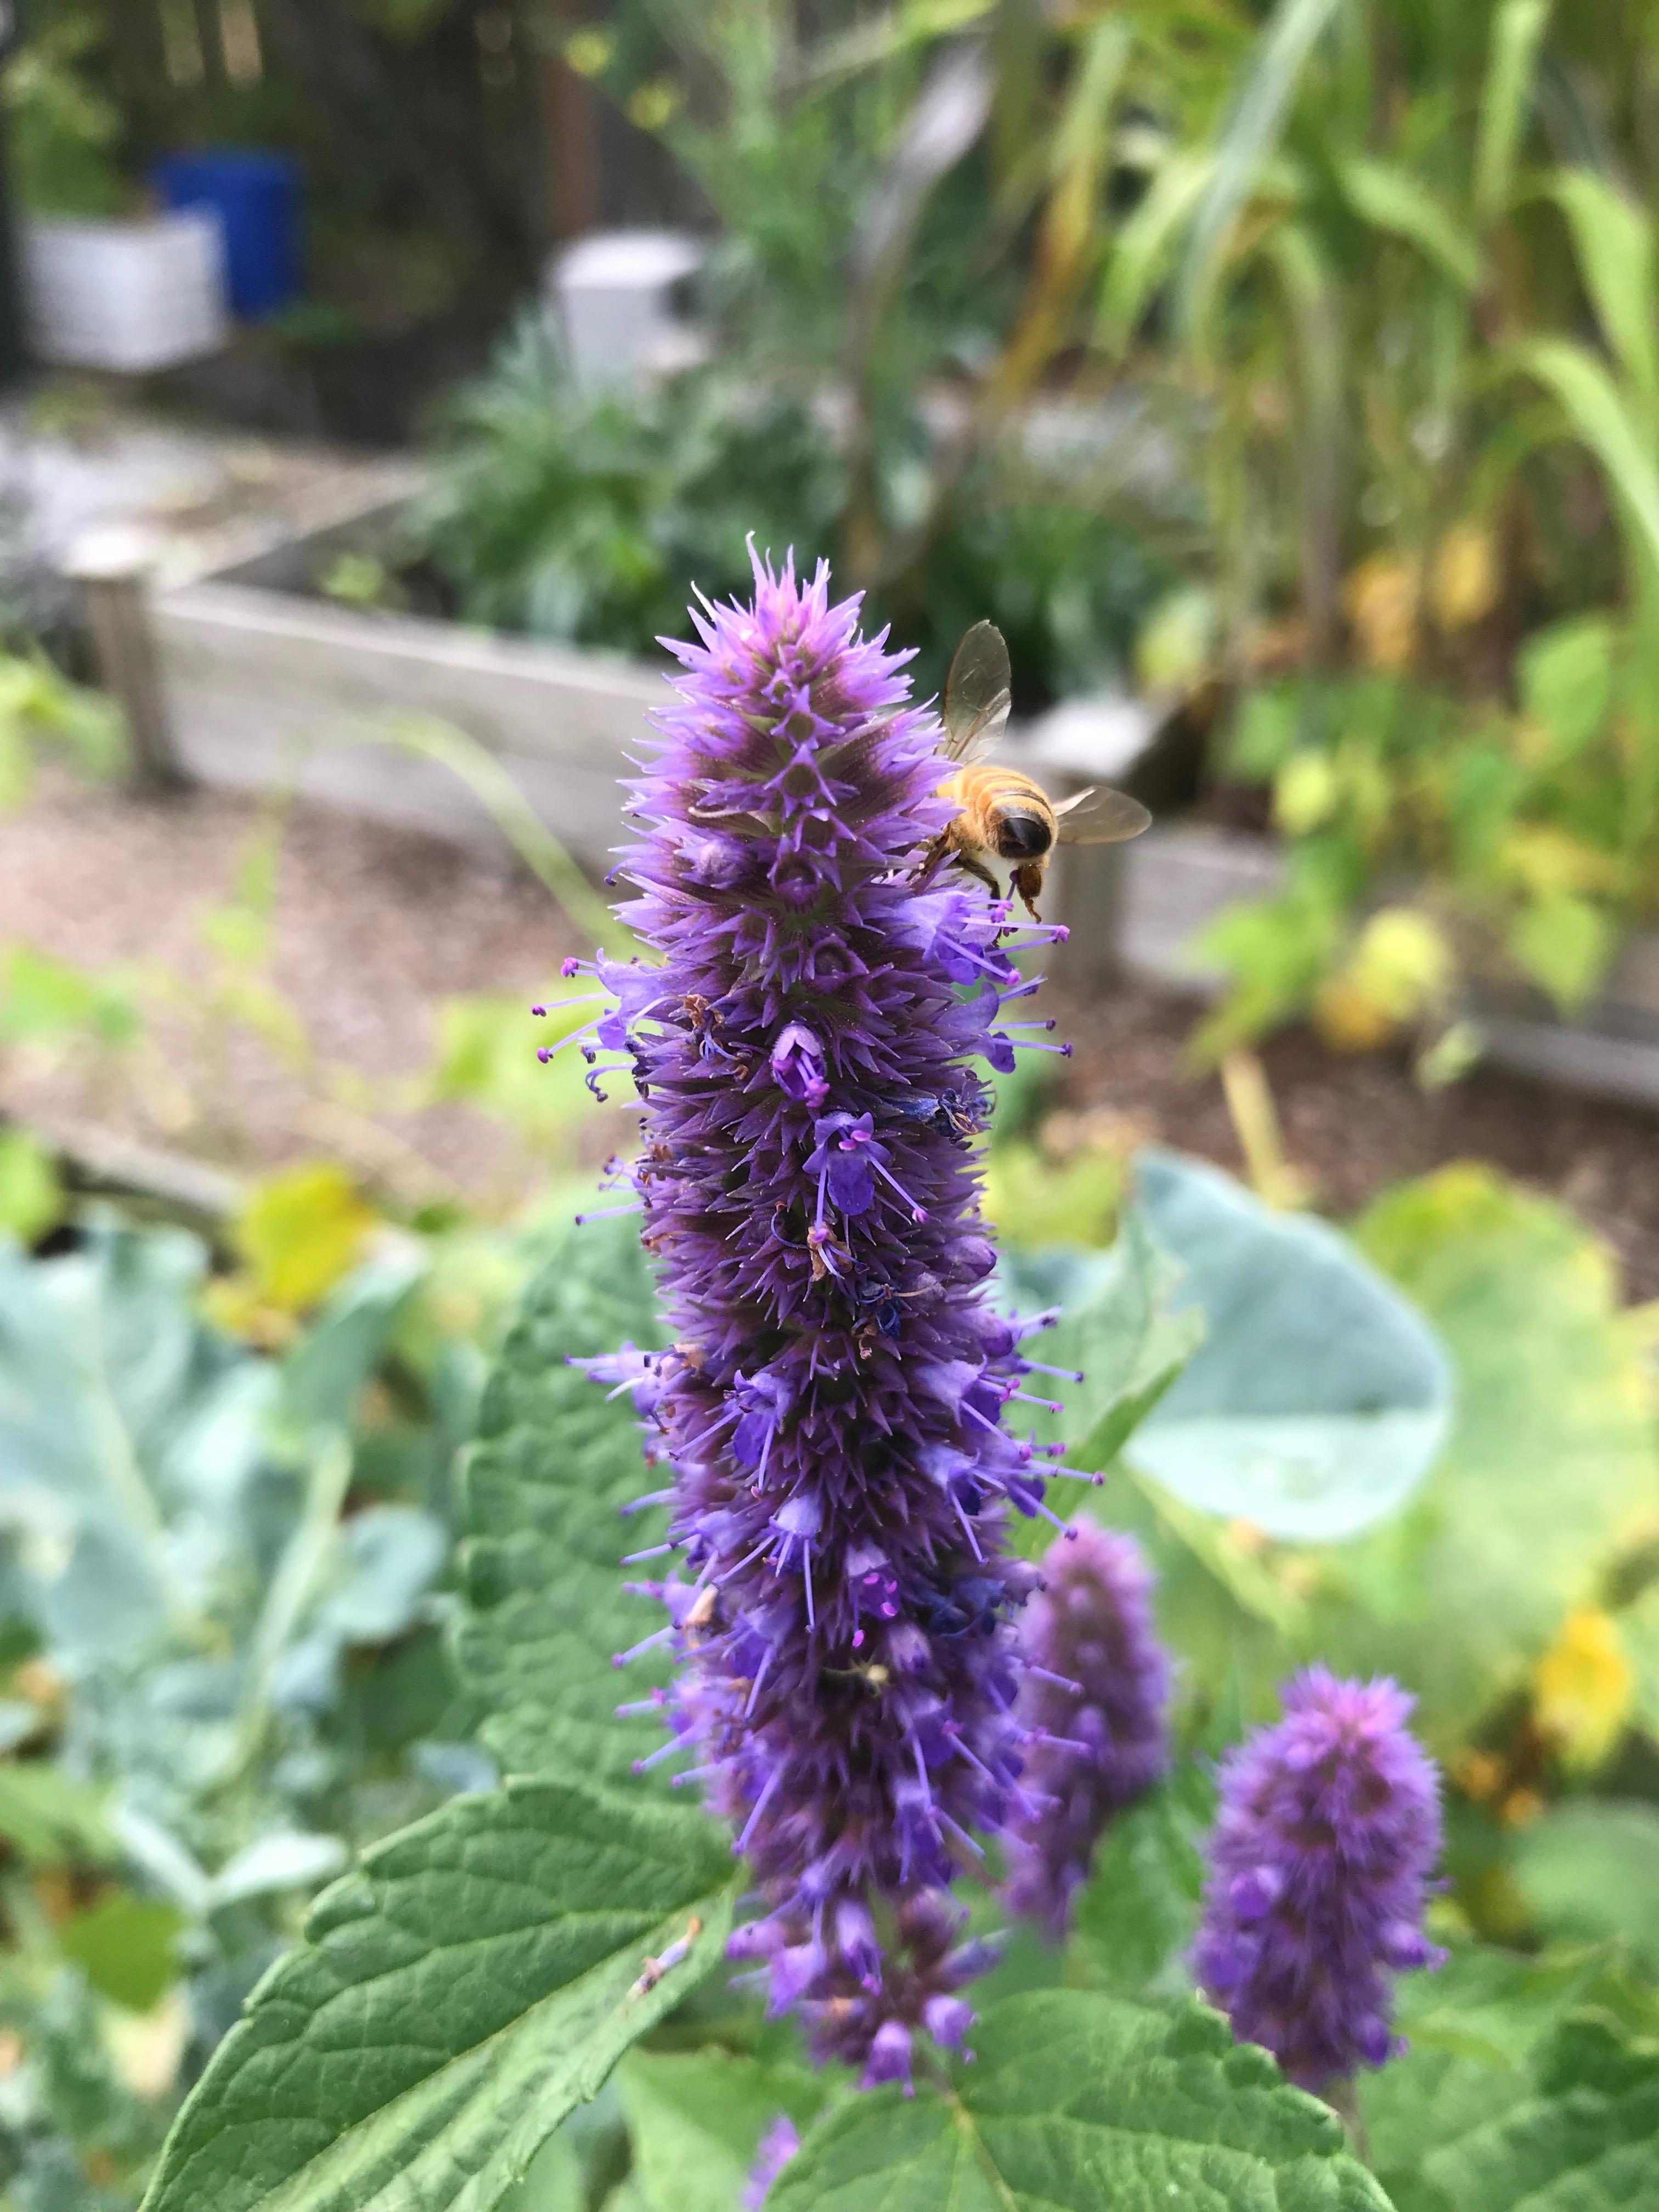 Honeybee on anise hyssop